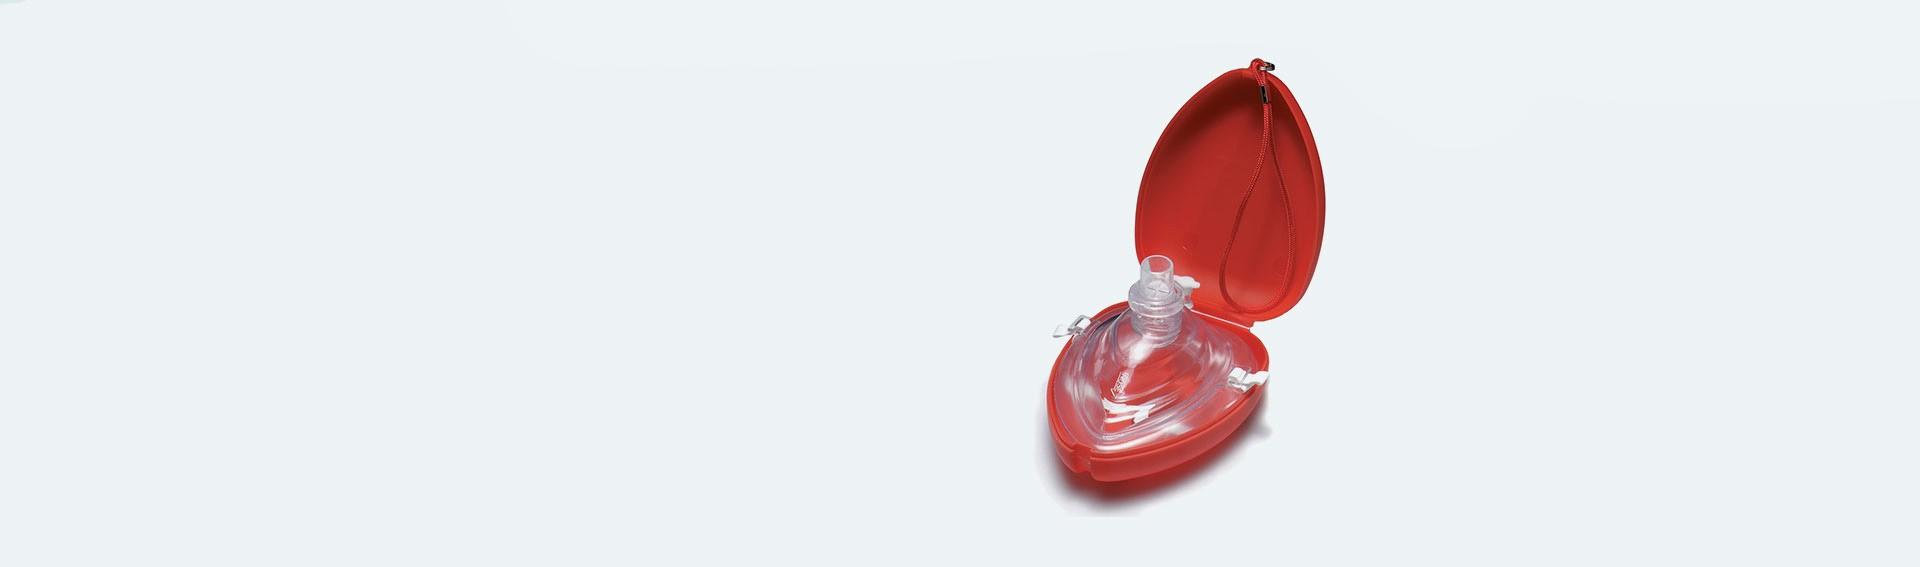 Maska ratownicza CPR